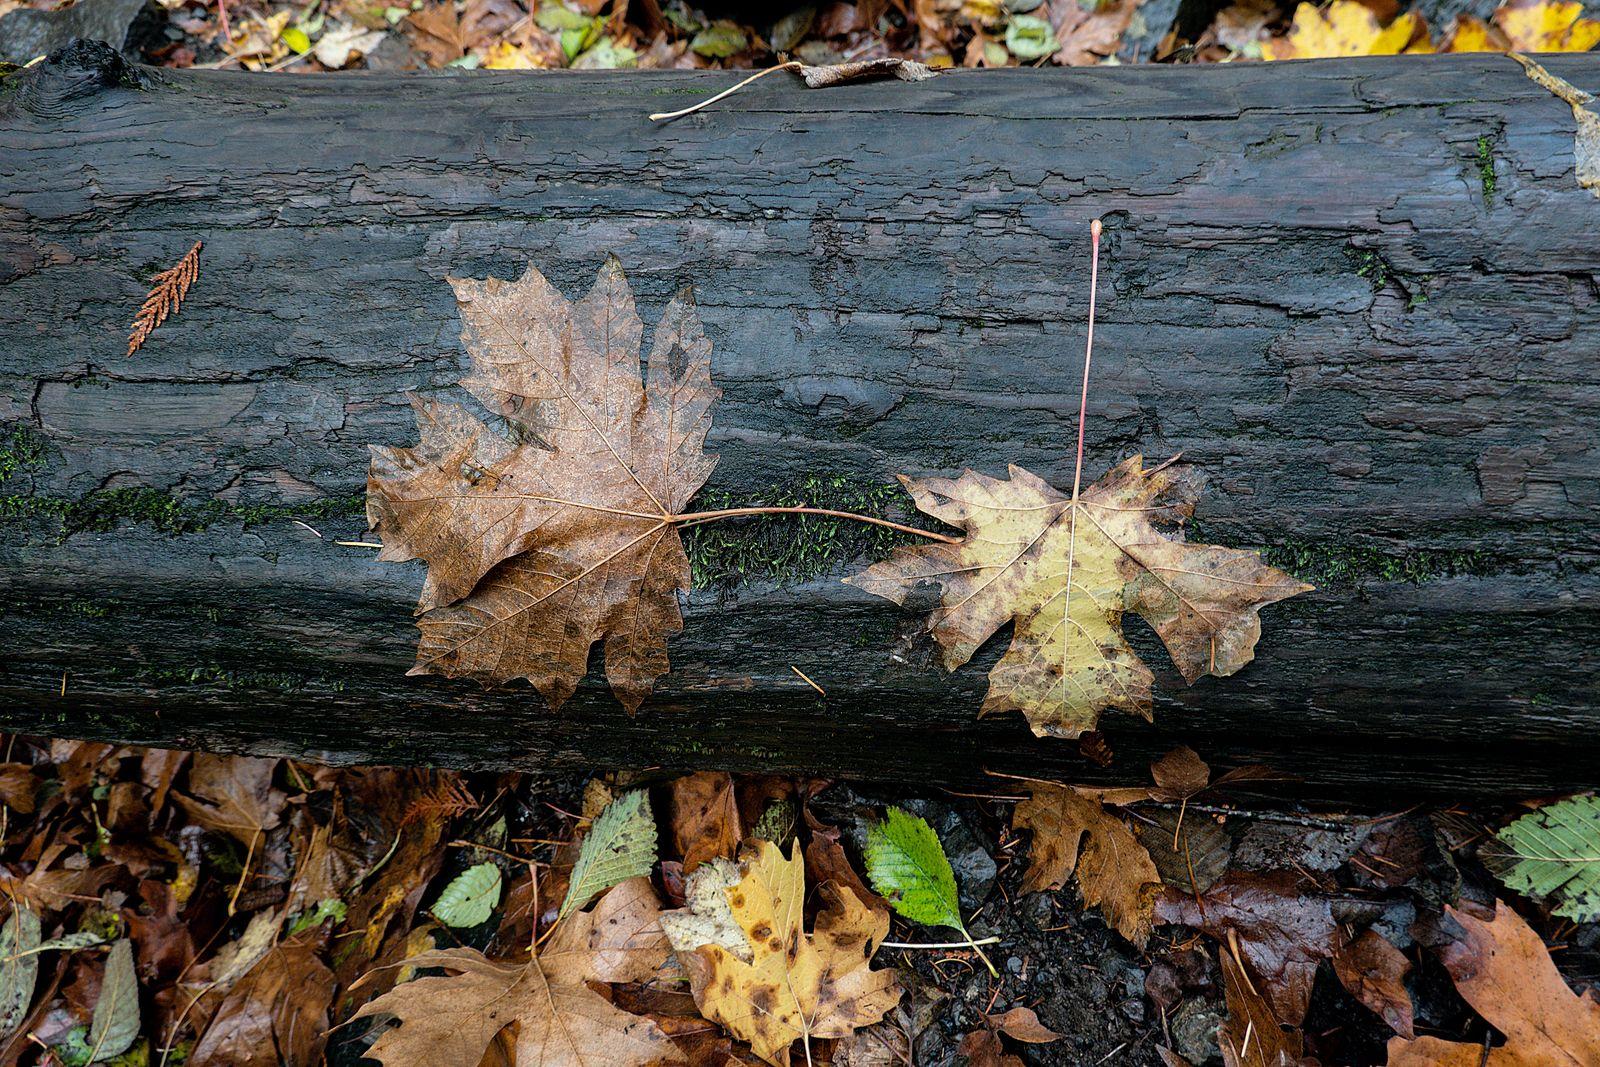 The fall leaves were everywhere